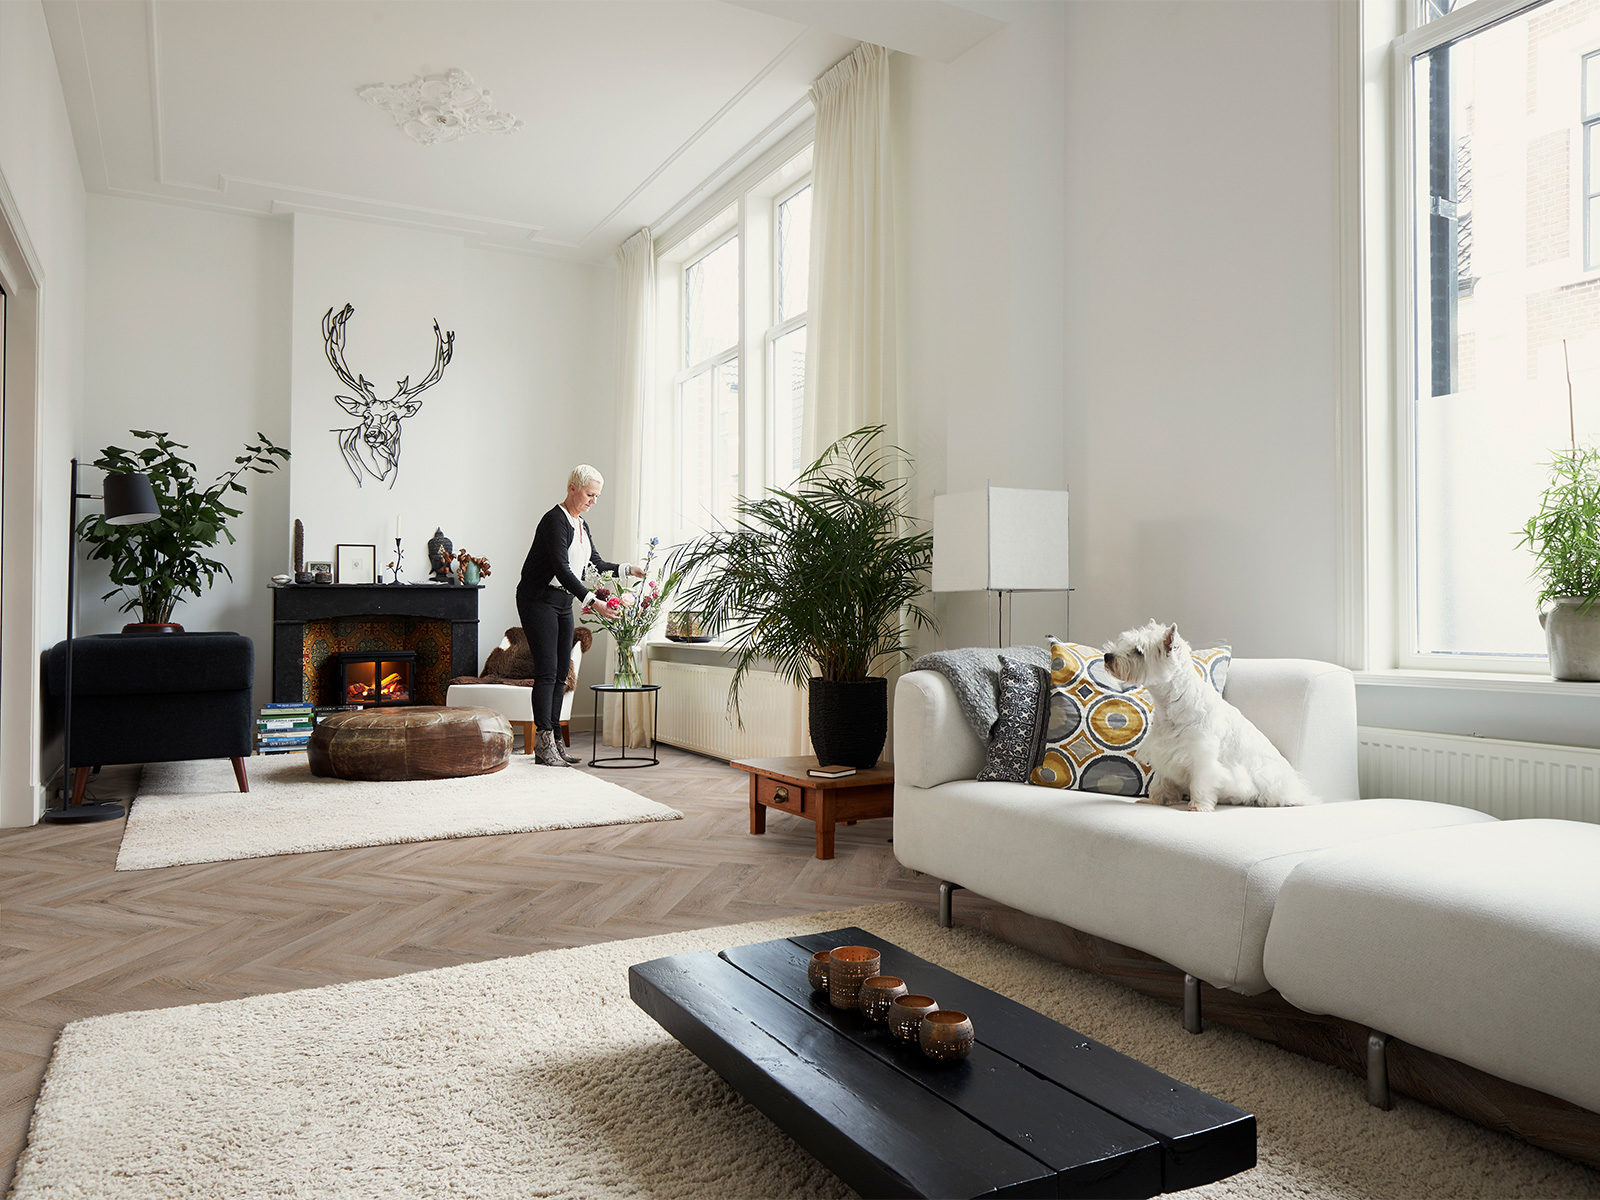 visgraat-houten-vloer-6810-sfeer